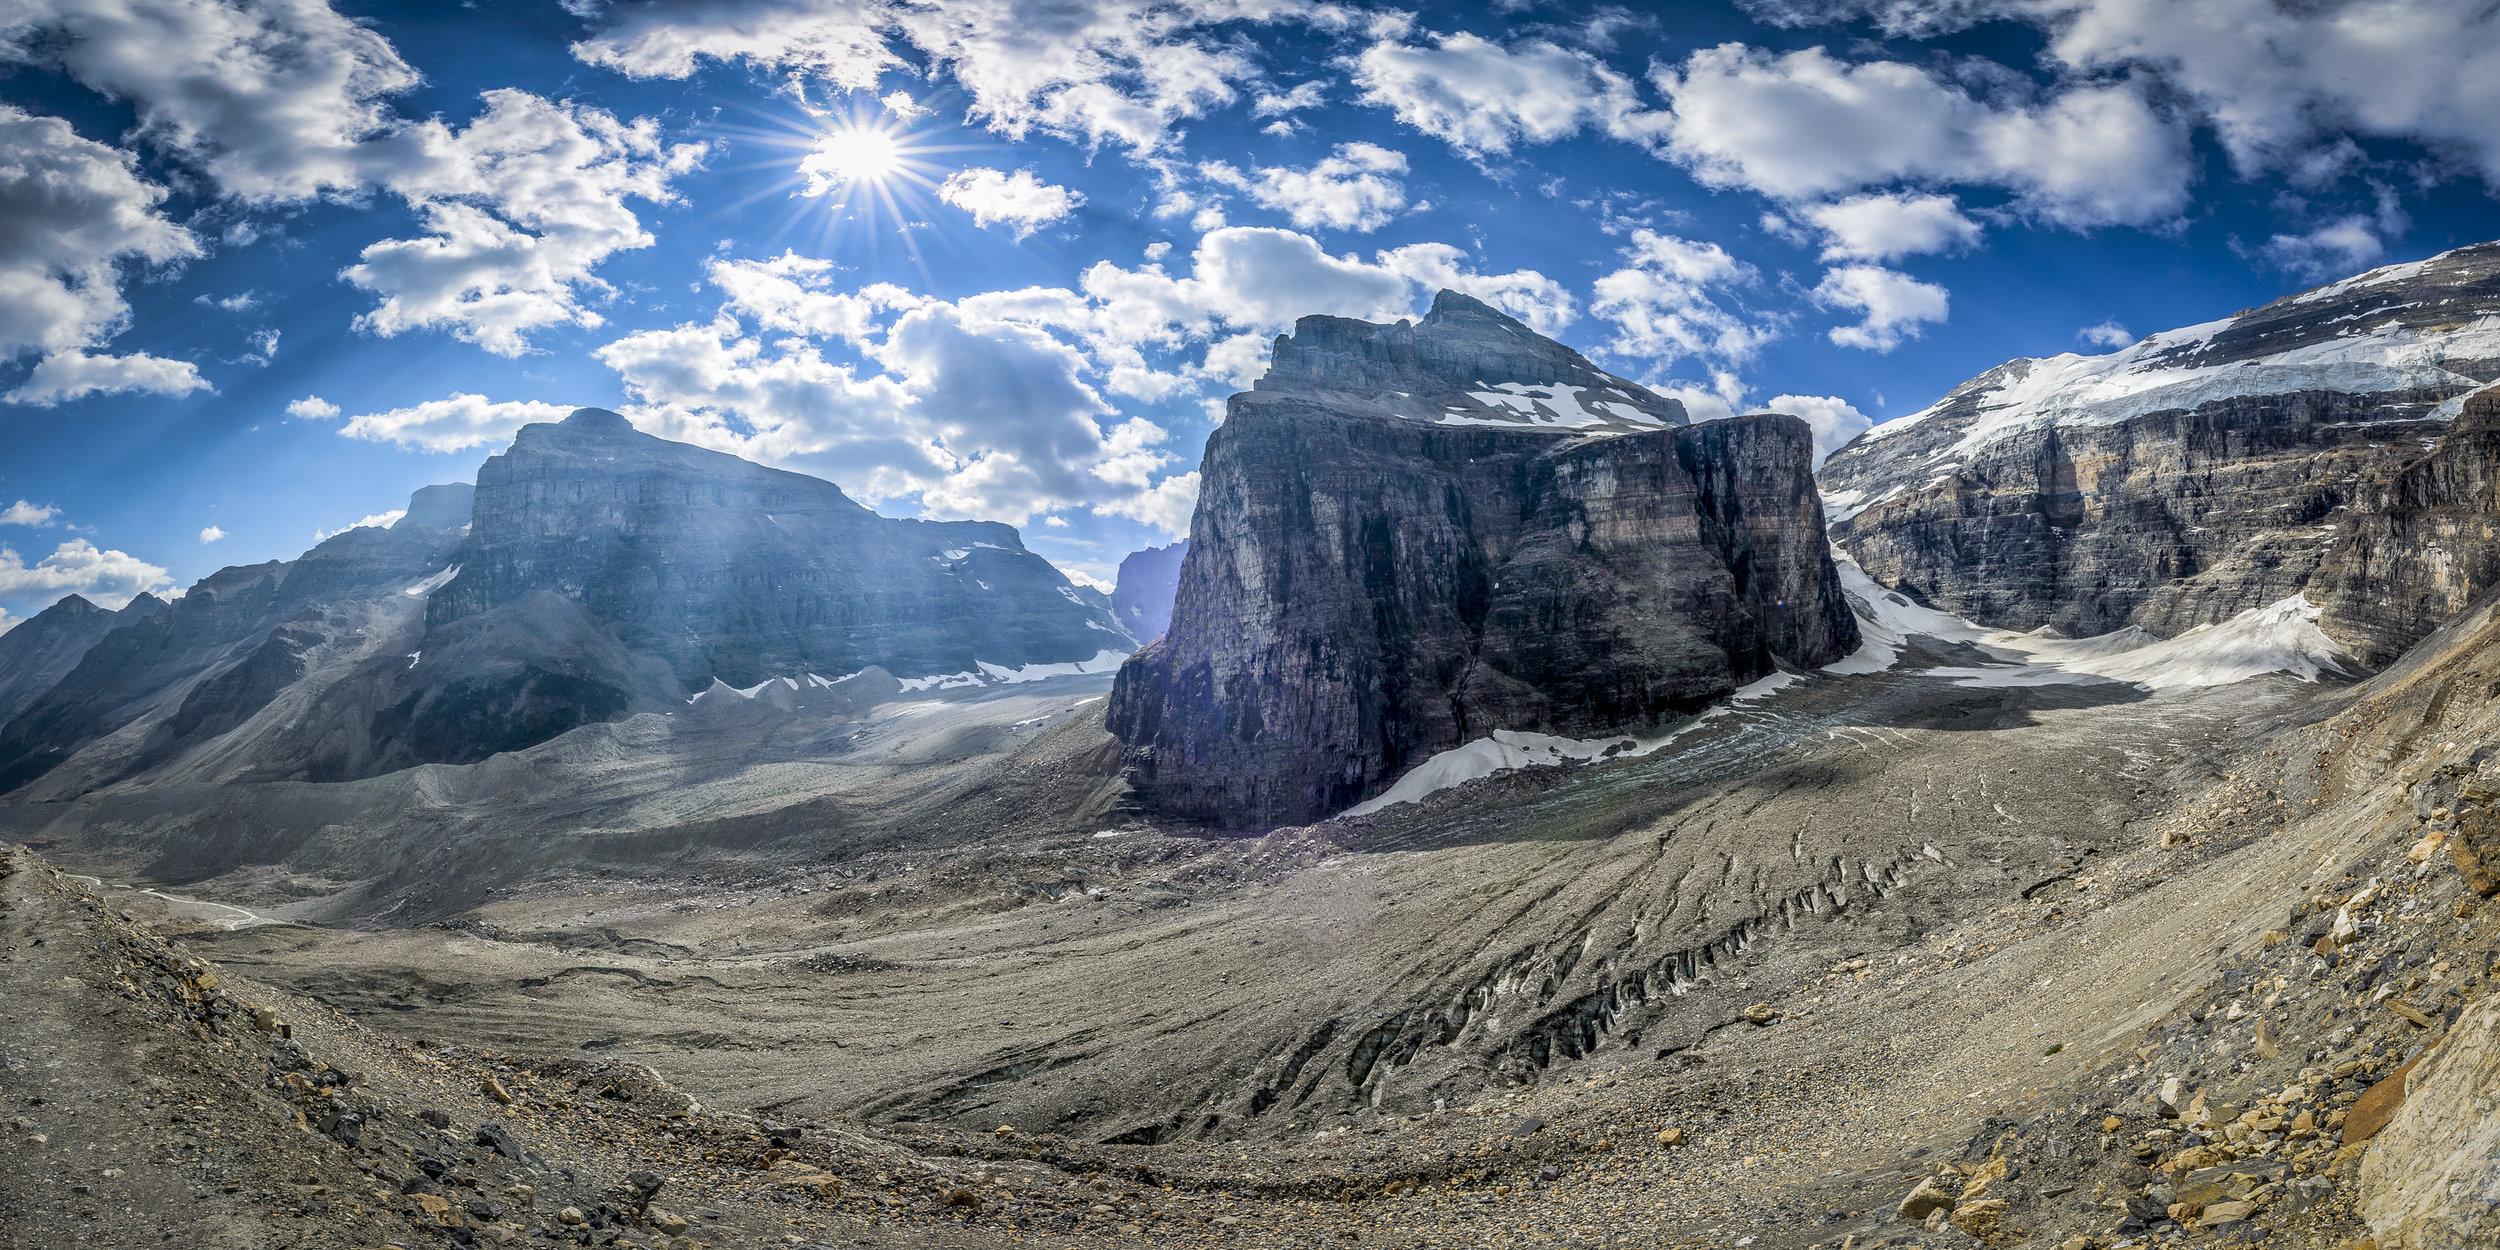 The Plain of Six Glaciers